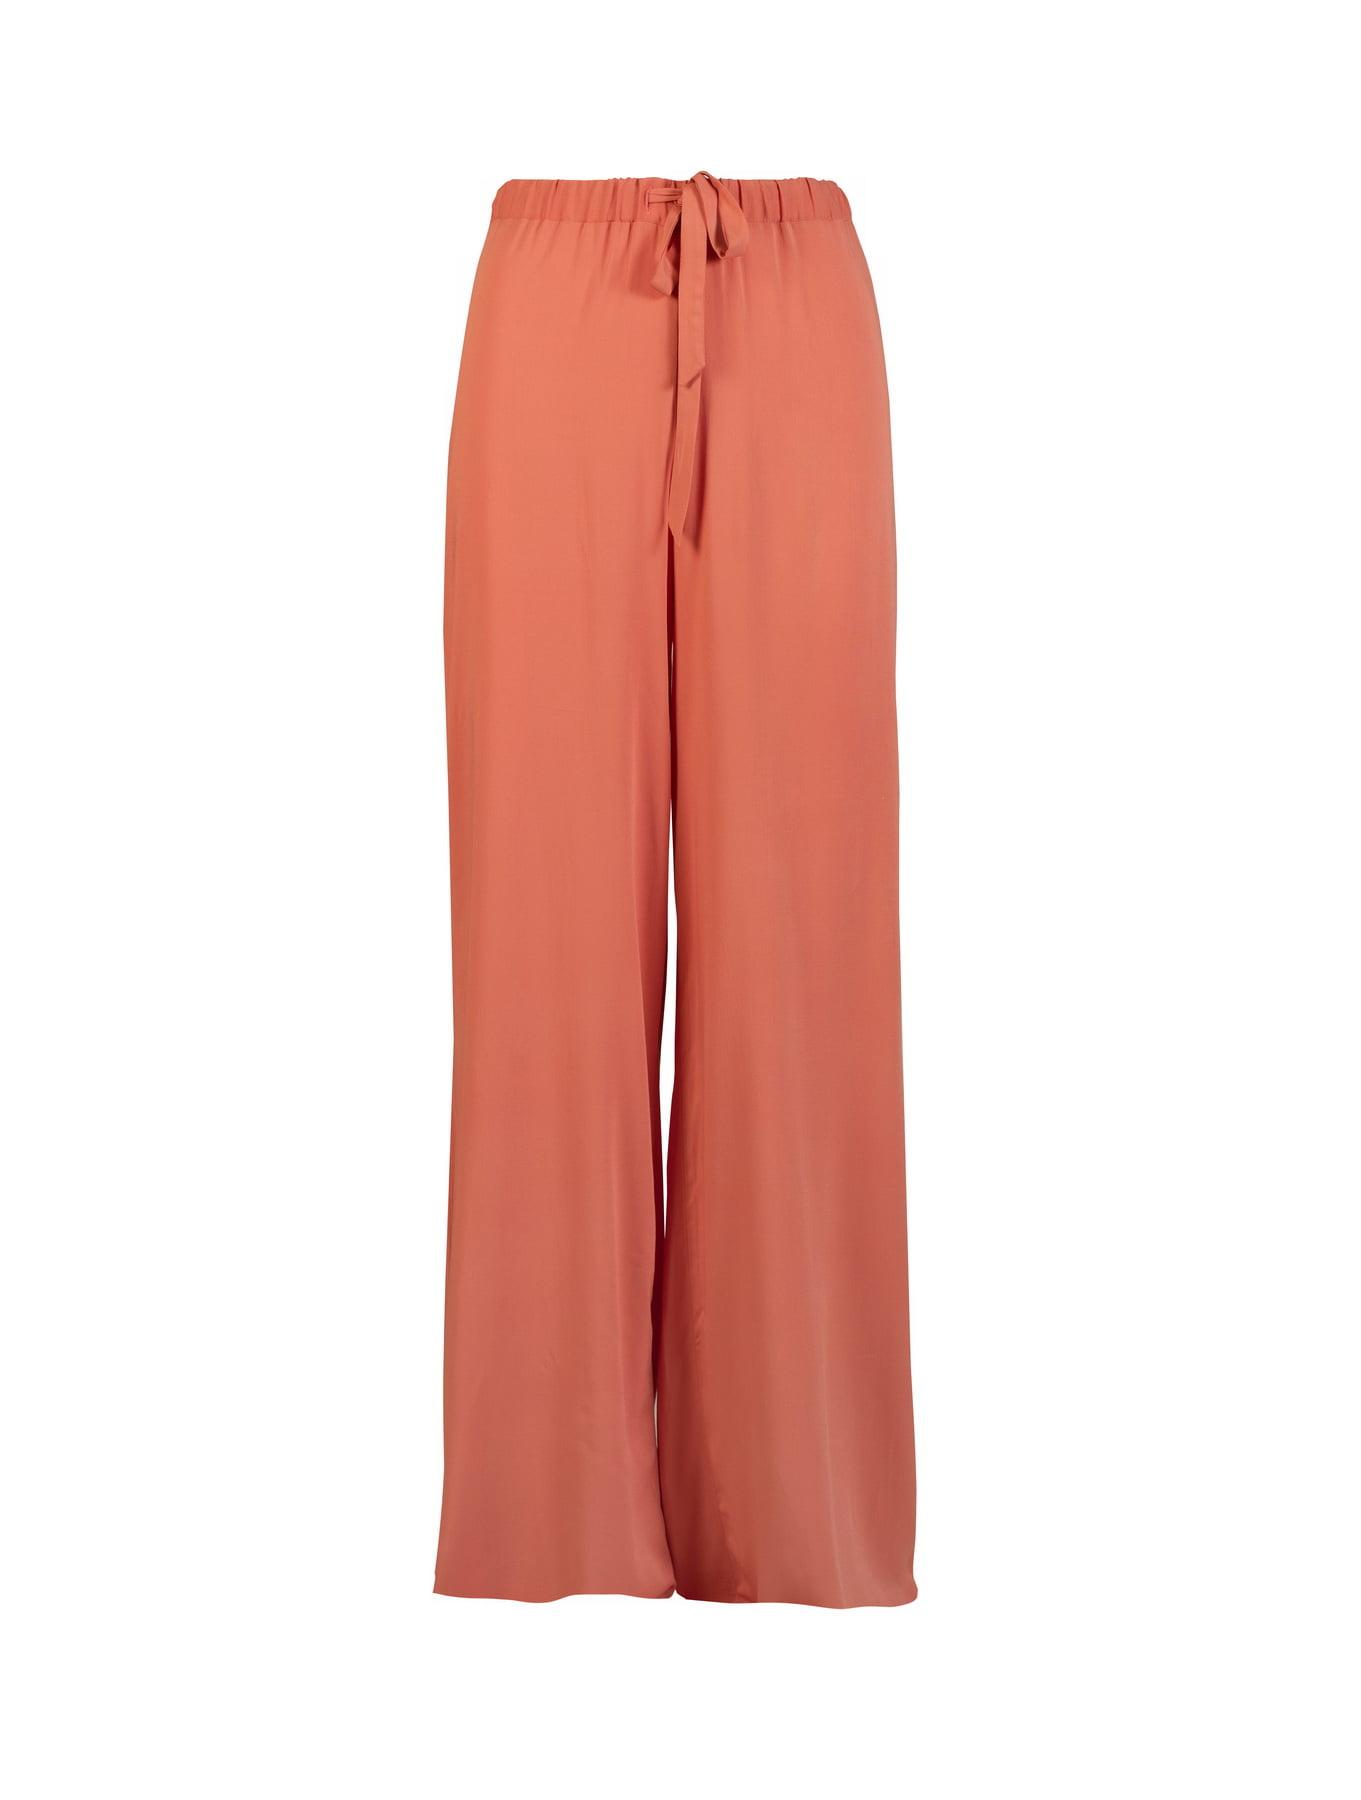 Fiorella pants